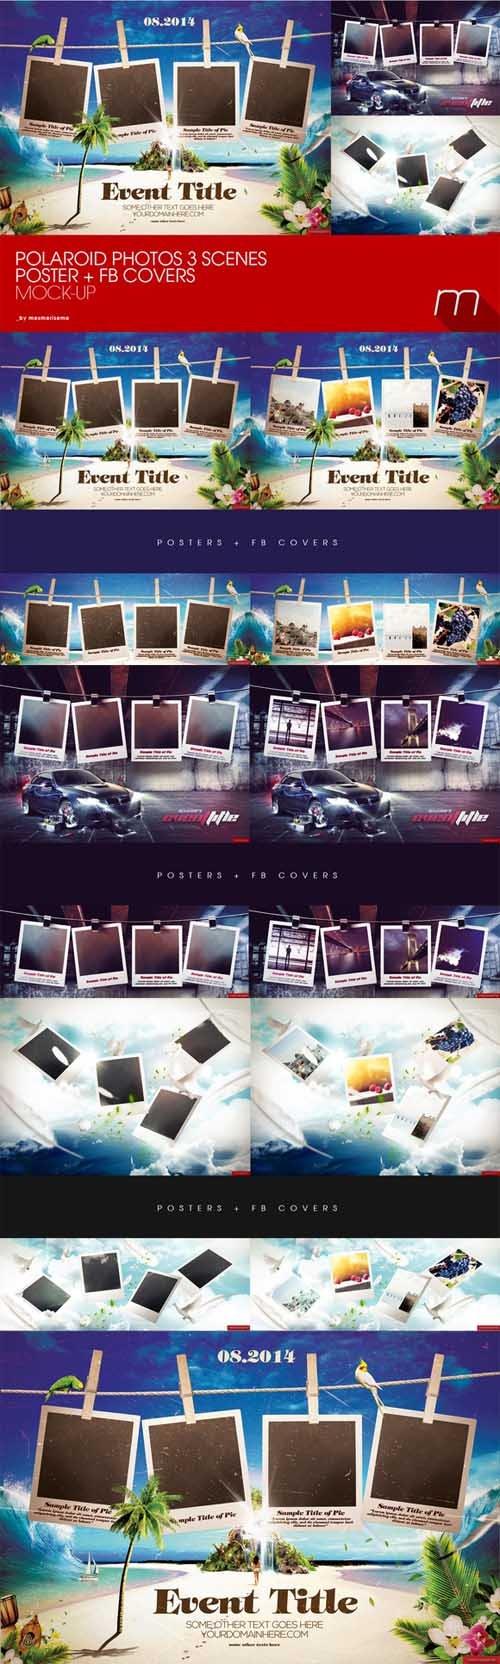 Polaroid Photos on 3 Scenes Mock-up